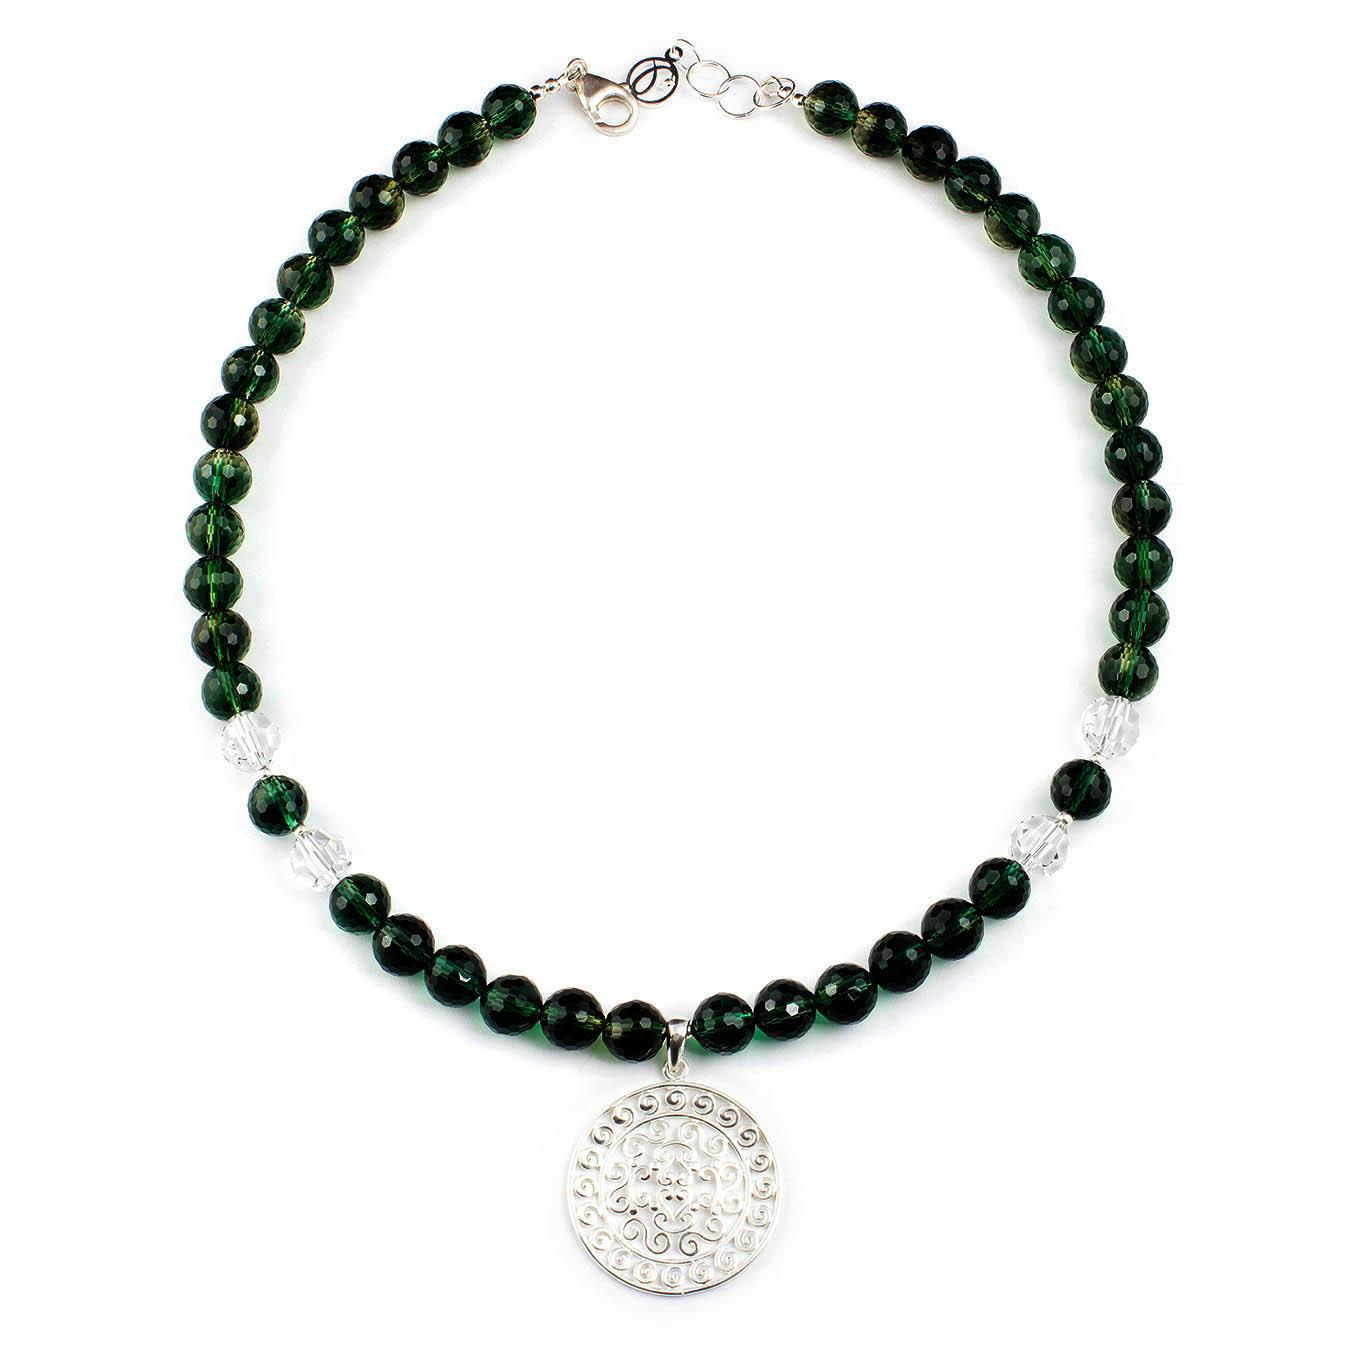 Beaded jewelry necklace with quartz, Swarovski and silver pendant